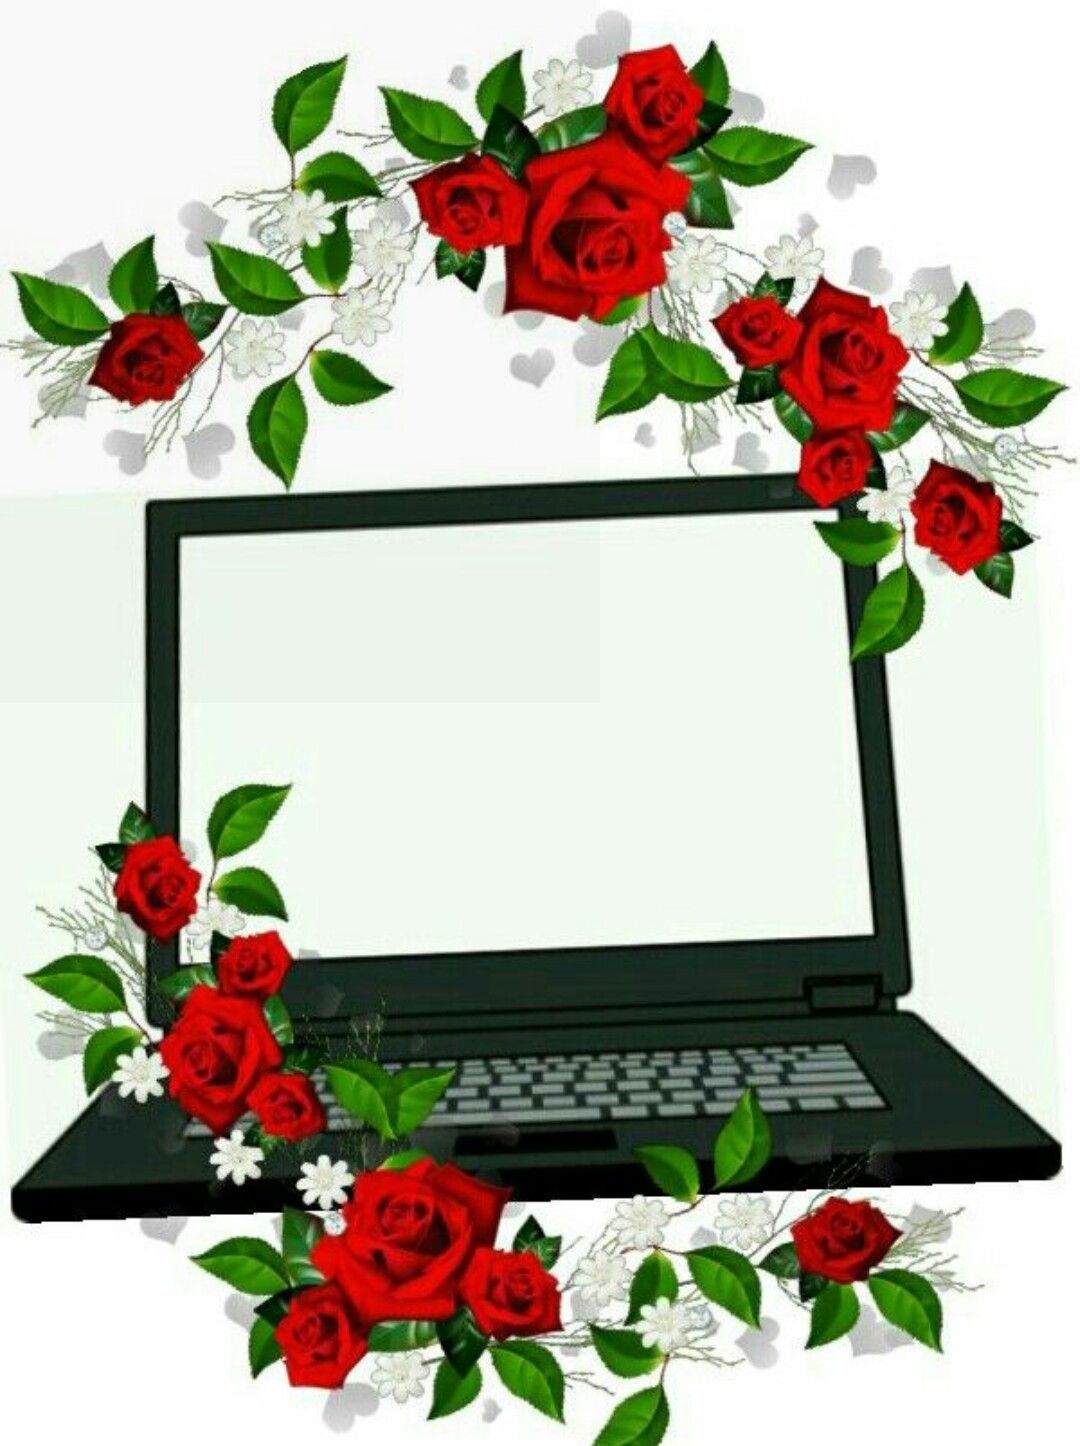 Pin Oleh هند Di Pc Seni Bunga Komputer